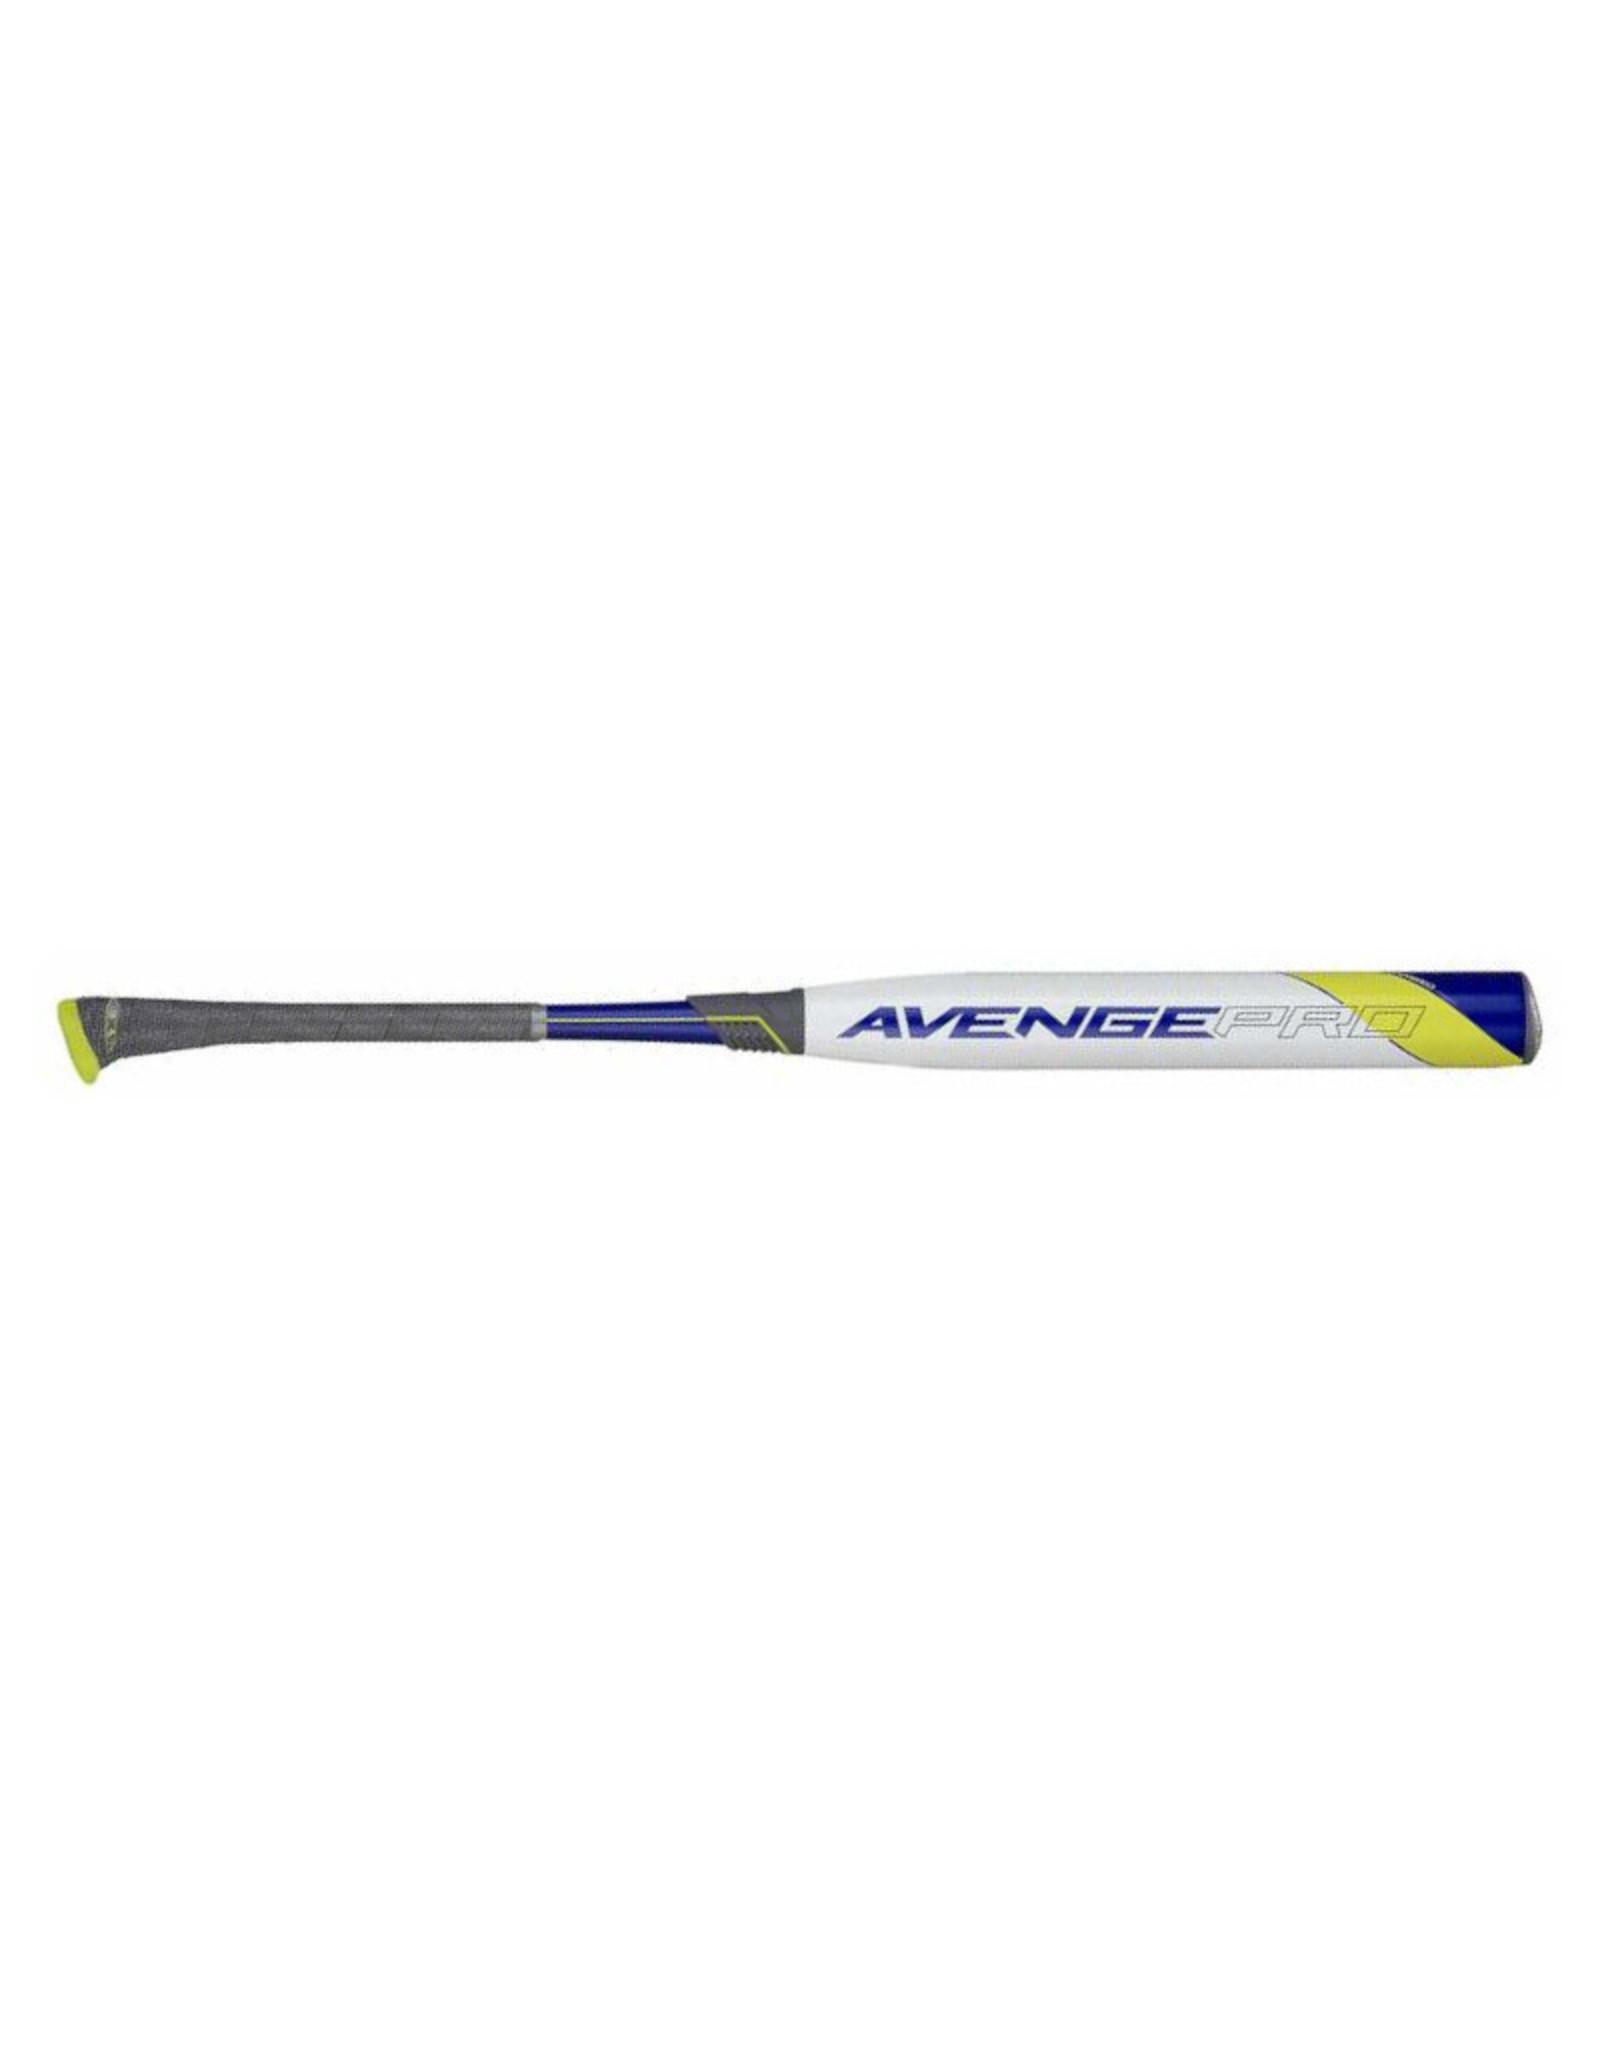 AXE BAT softball Avenger Pro 34-27 (-7) 2''1/4